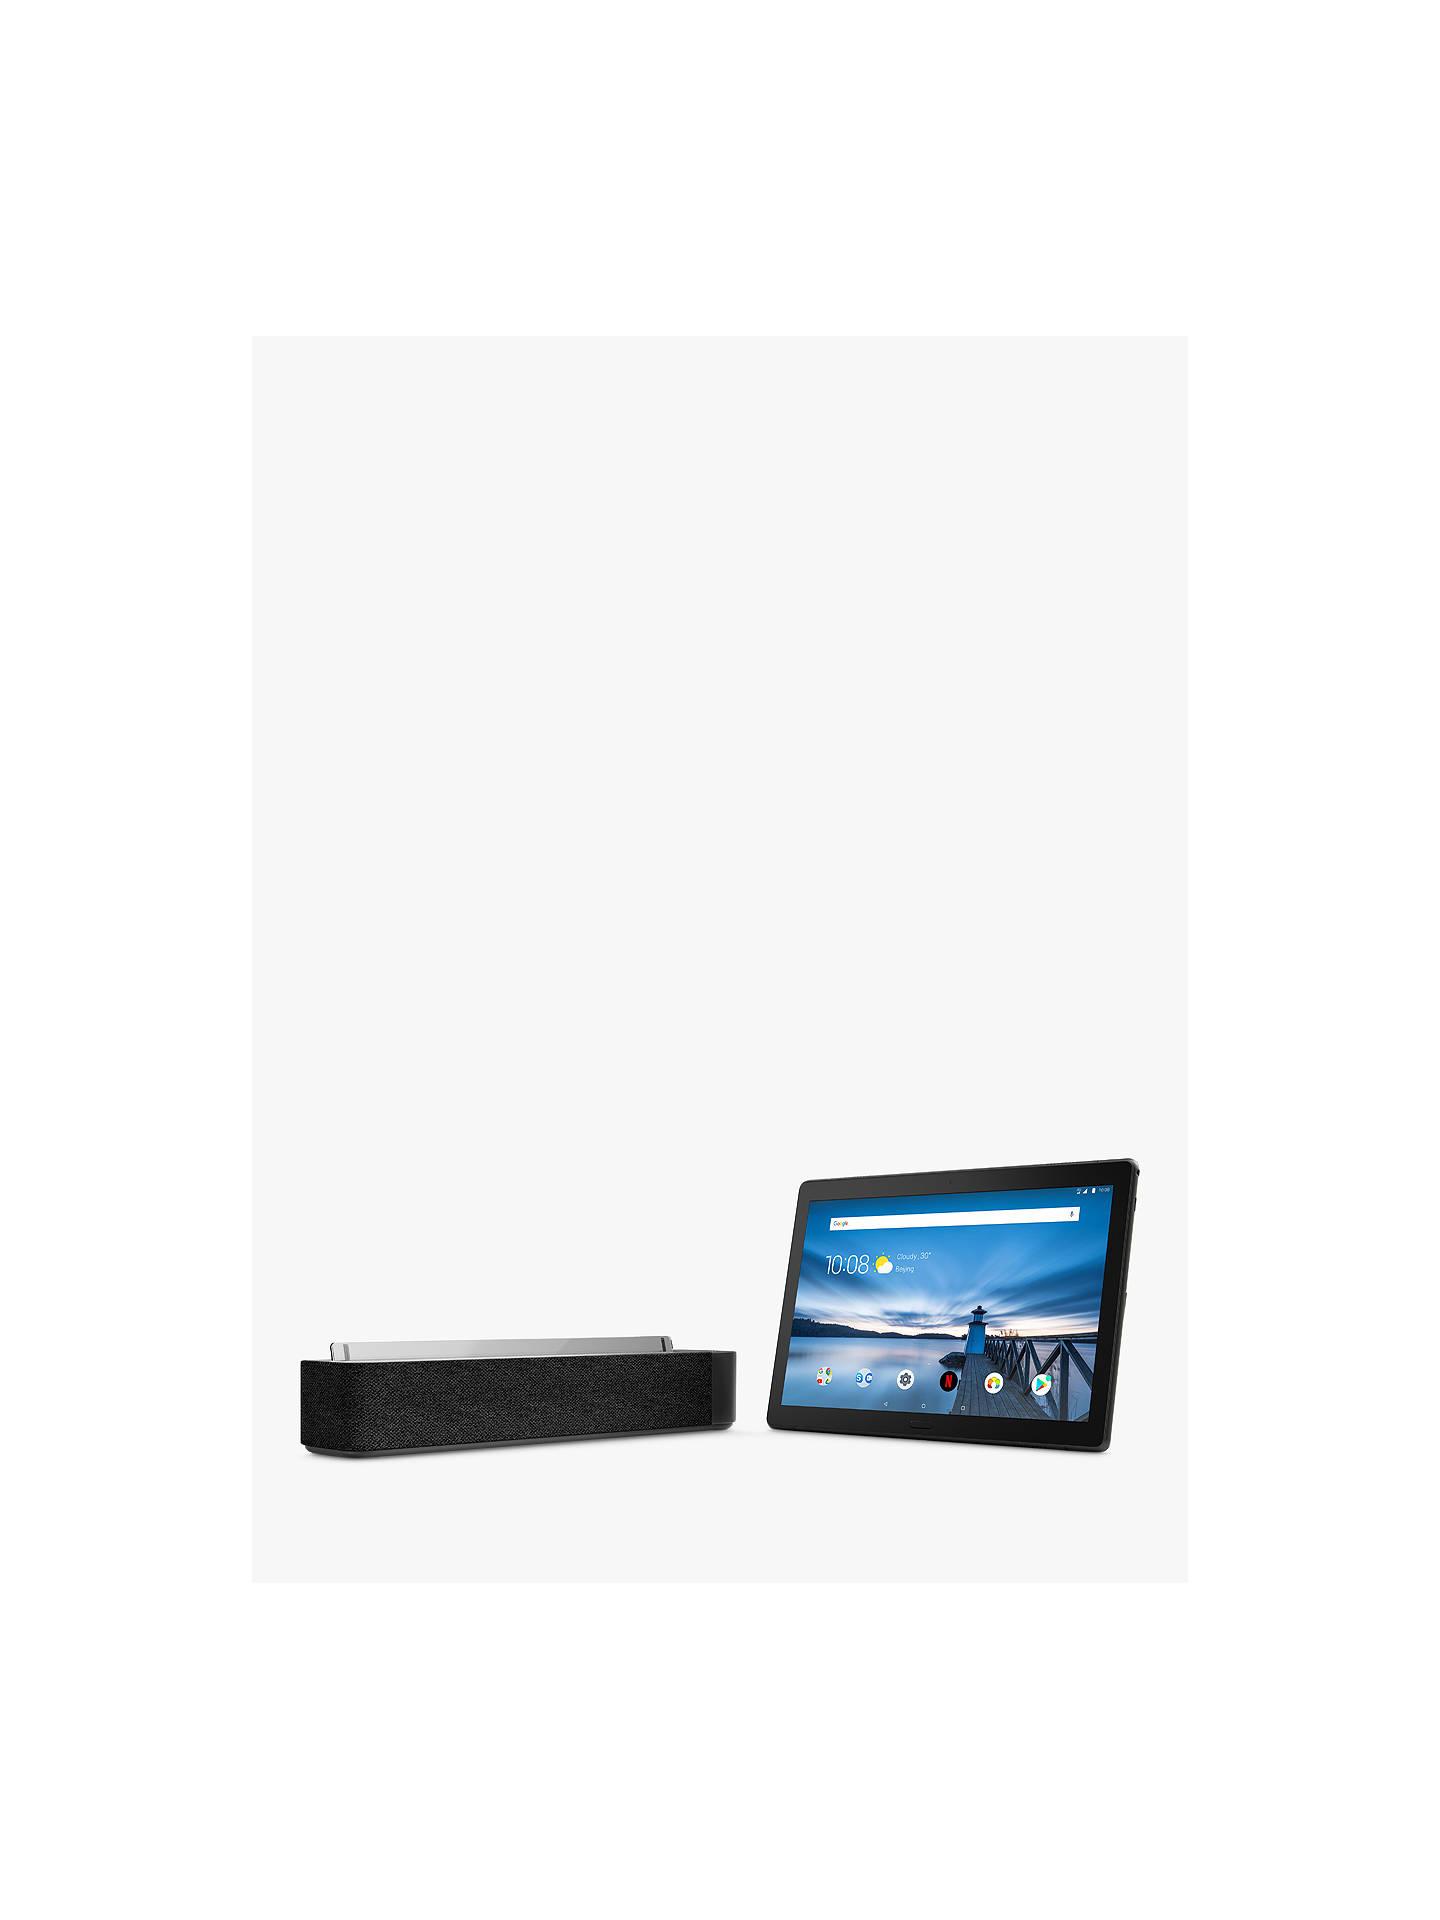 Lenovo P10 TB-X705F Tablet, Android, Wi-Fi, 3GB RAM, 32GB eMMC, 10 1